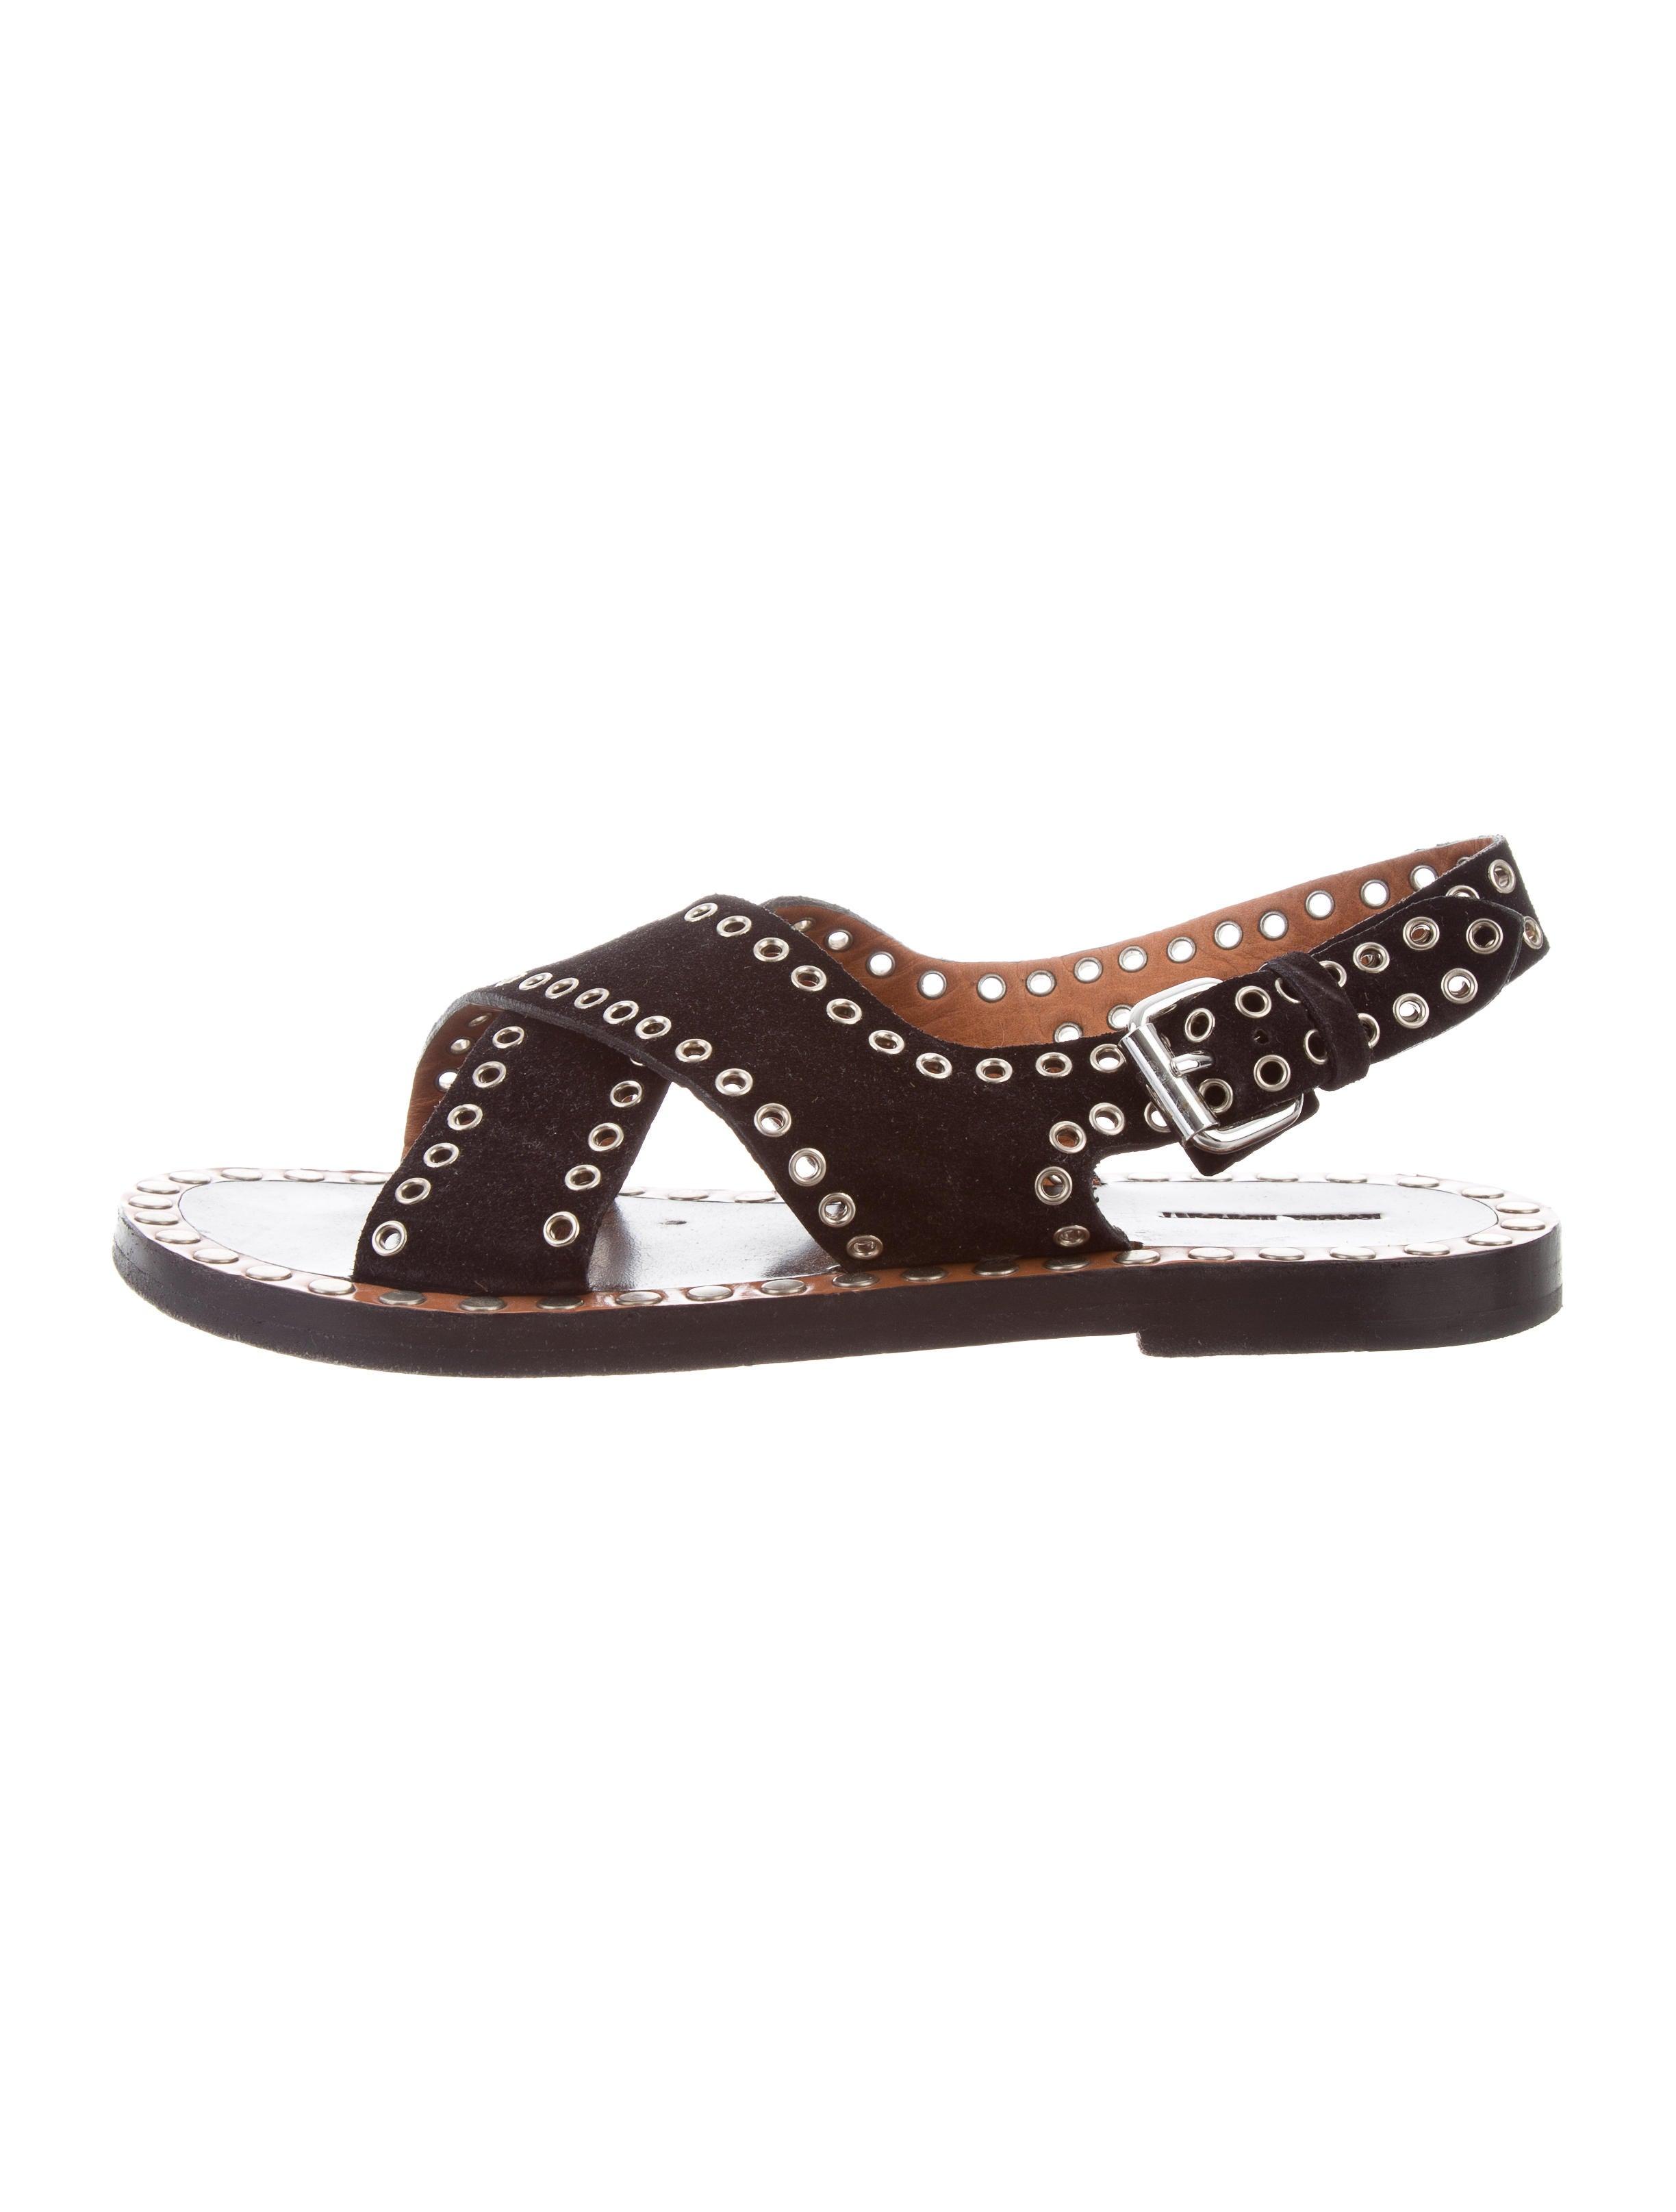 Isabel Marant Grommet Crossover Sandals cheap reliable sale sast clearance shop outlet big discount GZCbxRd9We